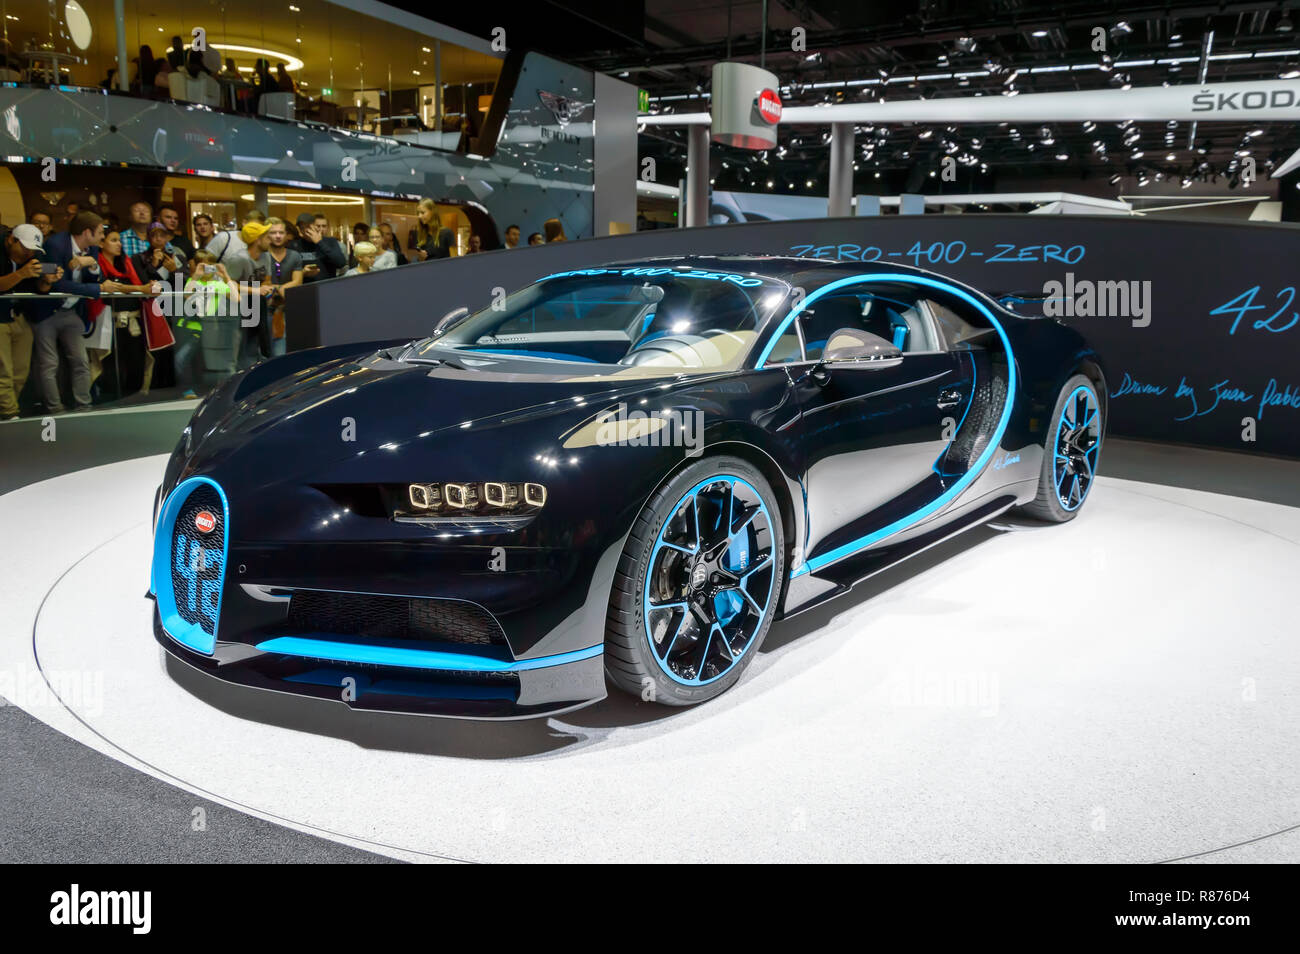 FRANKFURT - SEP 2017: Bugatti Chiron 0-400-0 at IAA Frankfurt Motor Show. Supercar set acceleration world record reaching 400 kmh in 42 seconds. - Stock Image